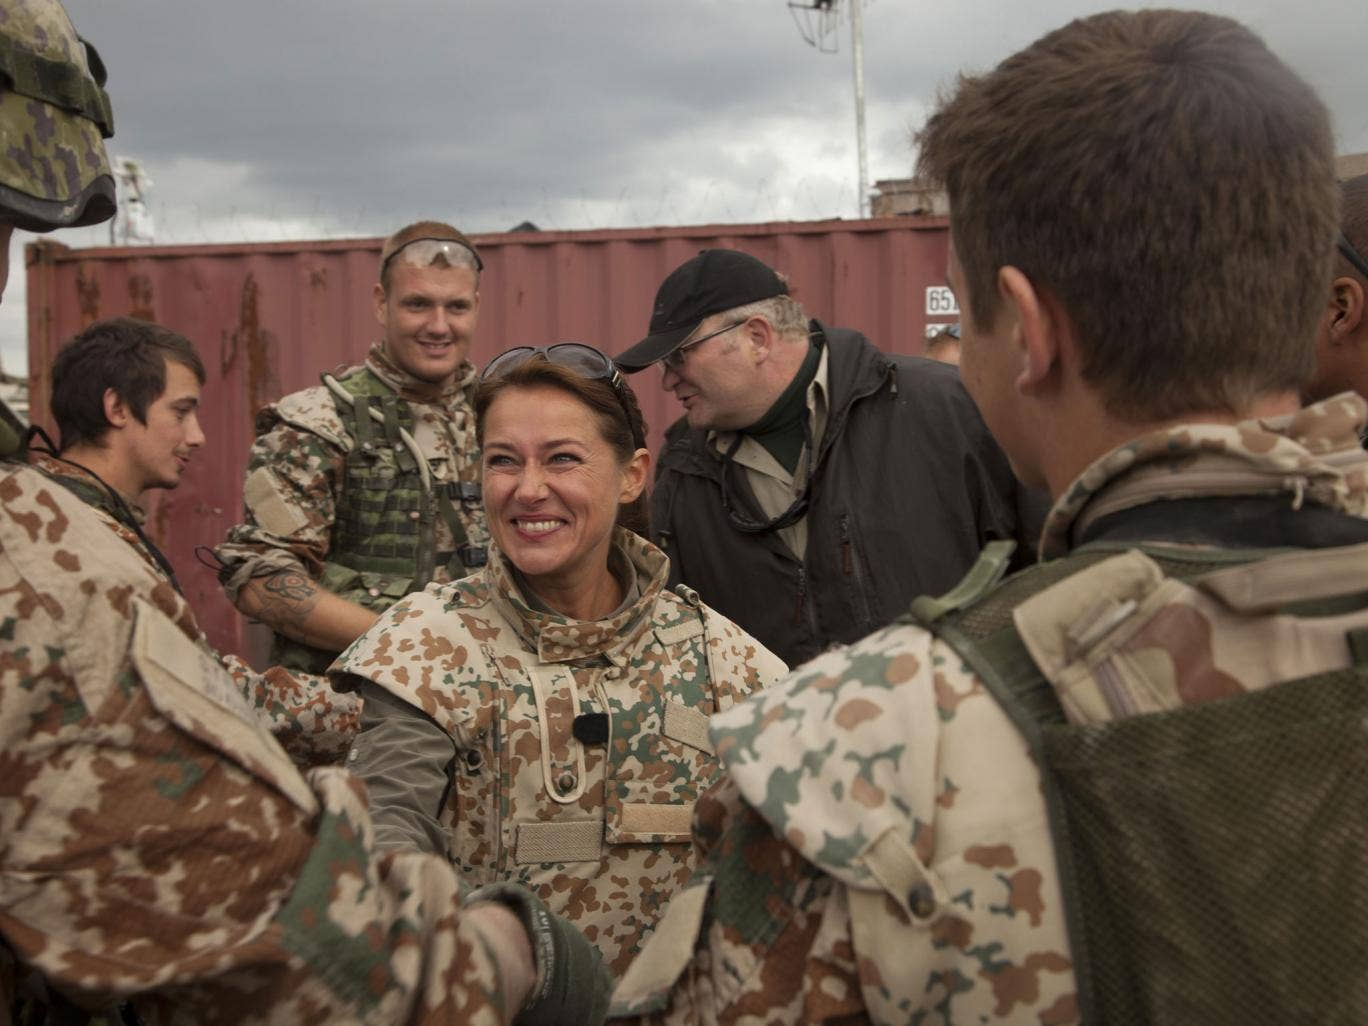 Sidse Babett Knudsen, centre, as Denmark's PM Birgitte Nyborg Christensen, with Danish soldiers in Afghanistan